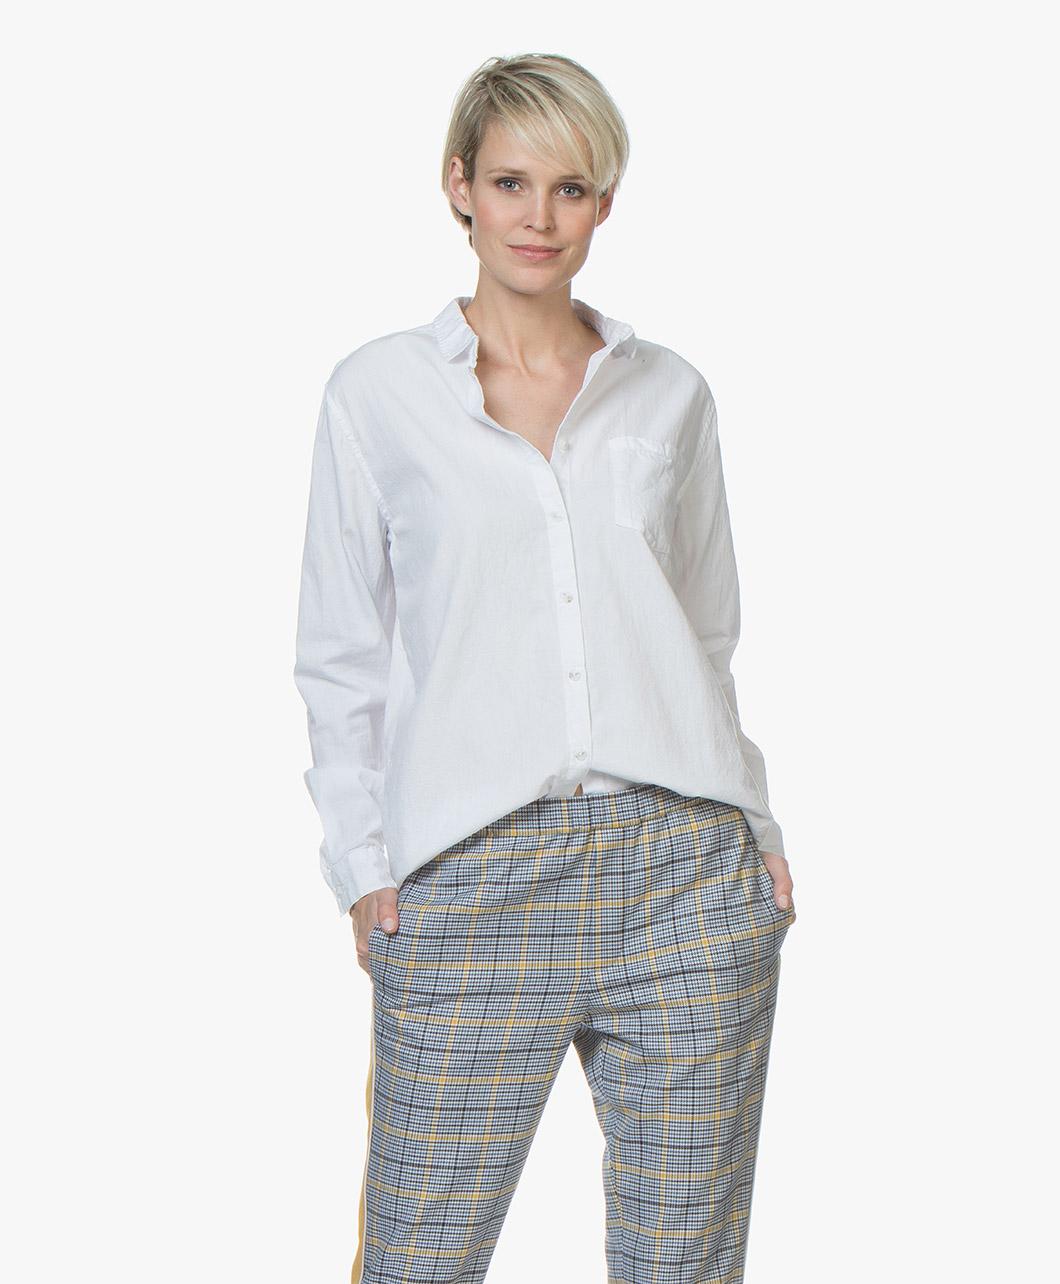 Afbeelding van American Vintage Blouse Wit Pizabay Oversized Katoenen